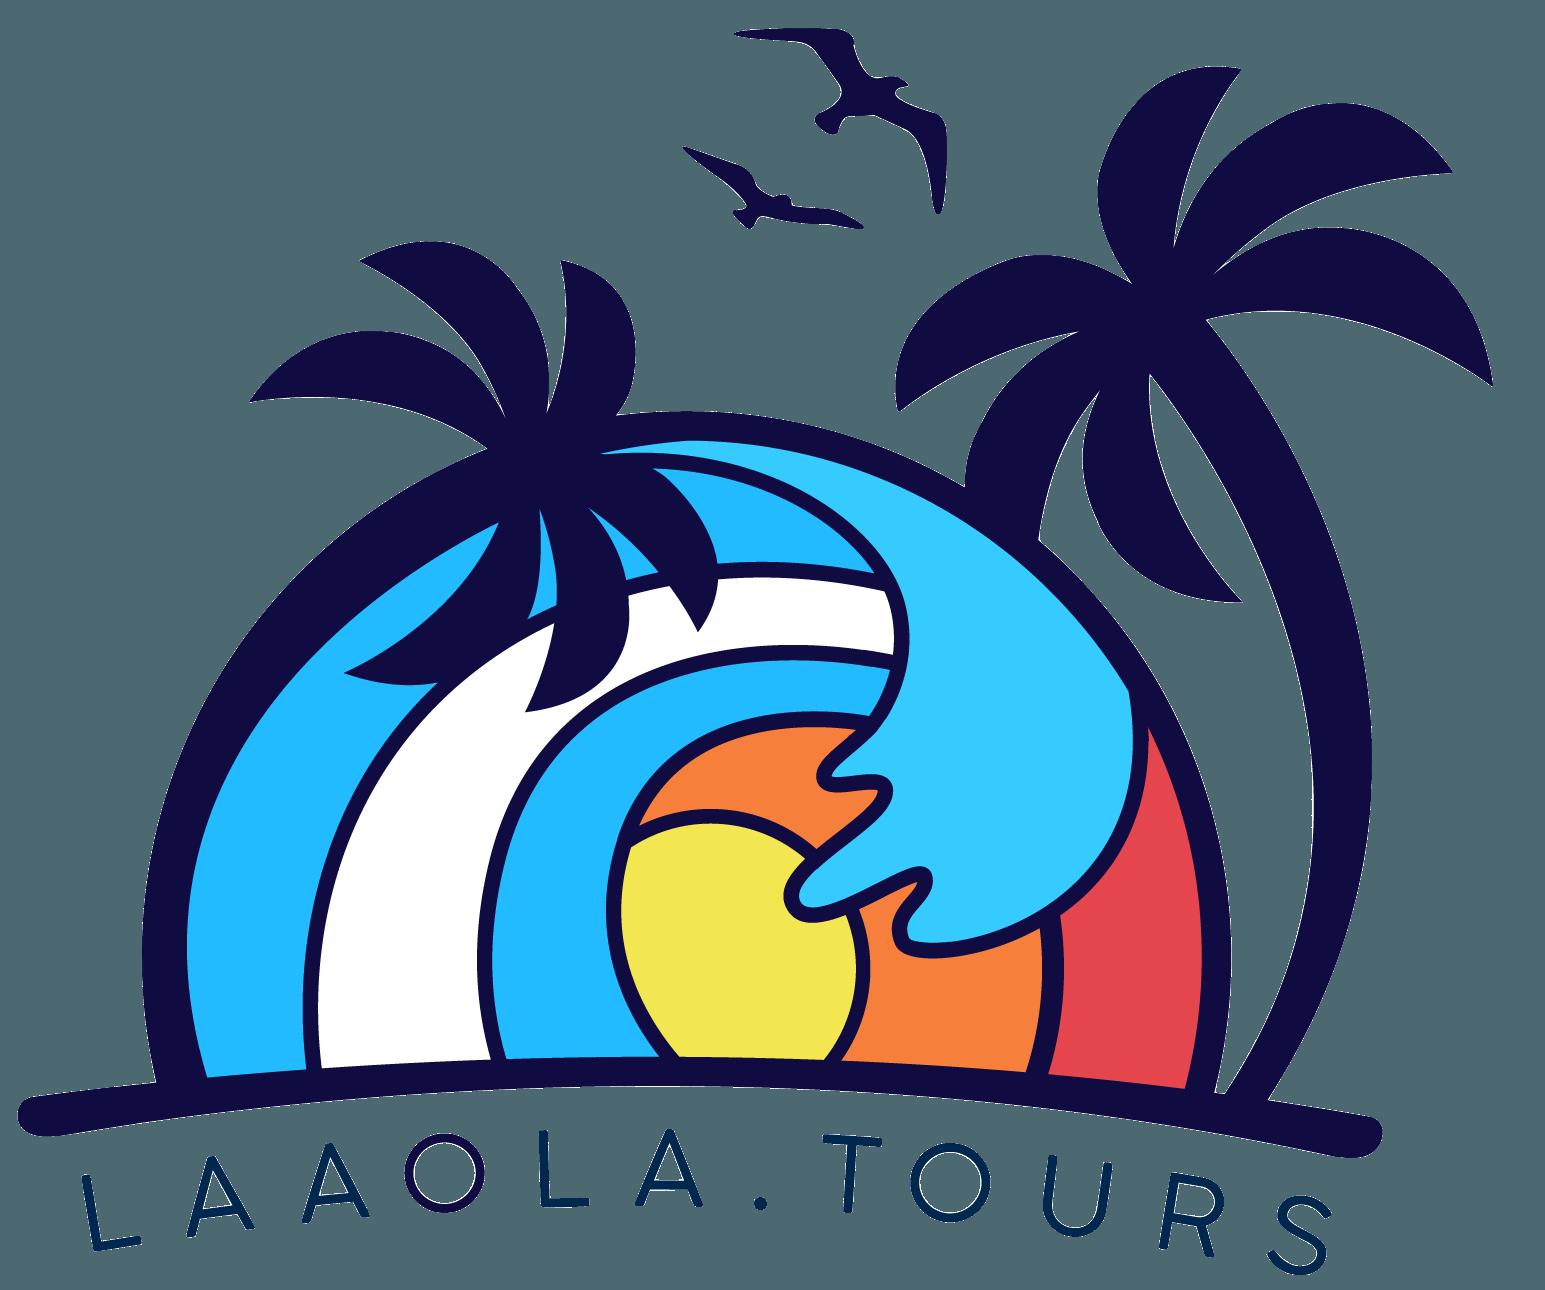 https://www.laaola.tours/wp-content/uploads/2019/12/LaaOlaTours-e1576784790523.png